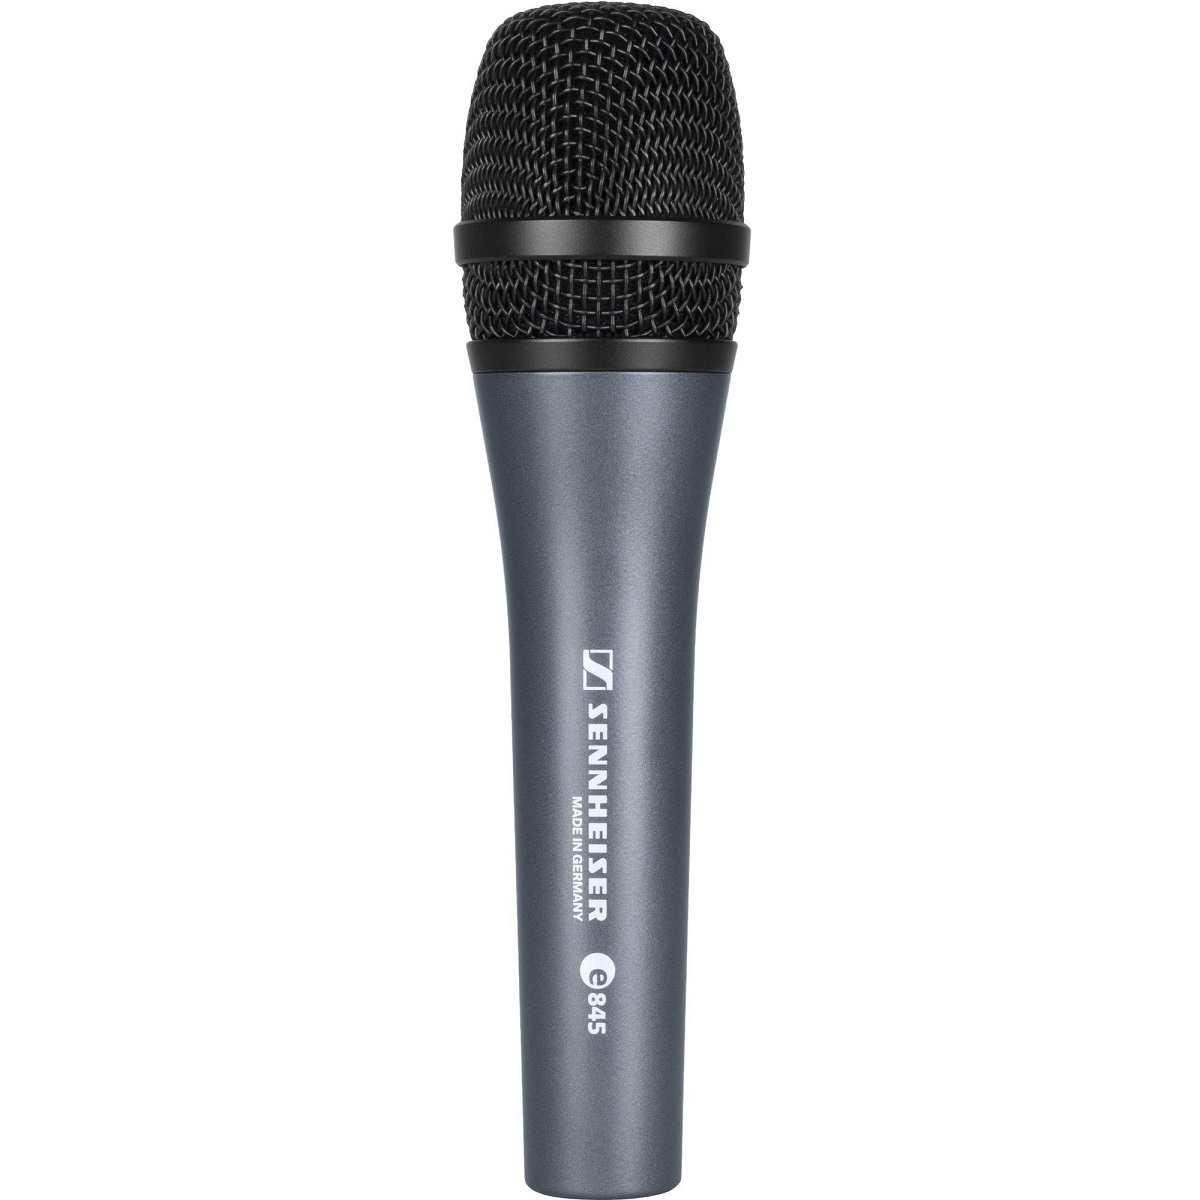 Microfone Dinâmico Super Cardióide E845 Sennheiser Profissional